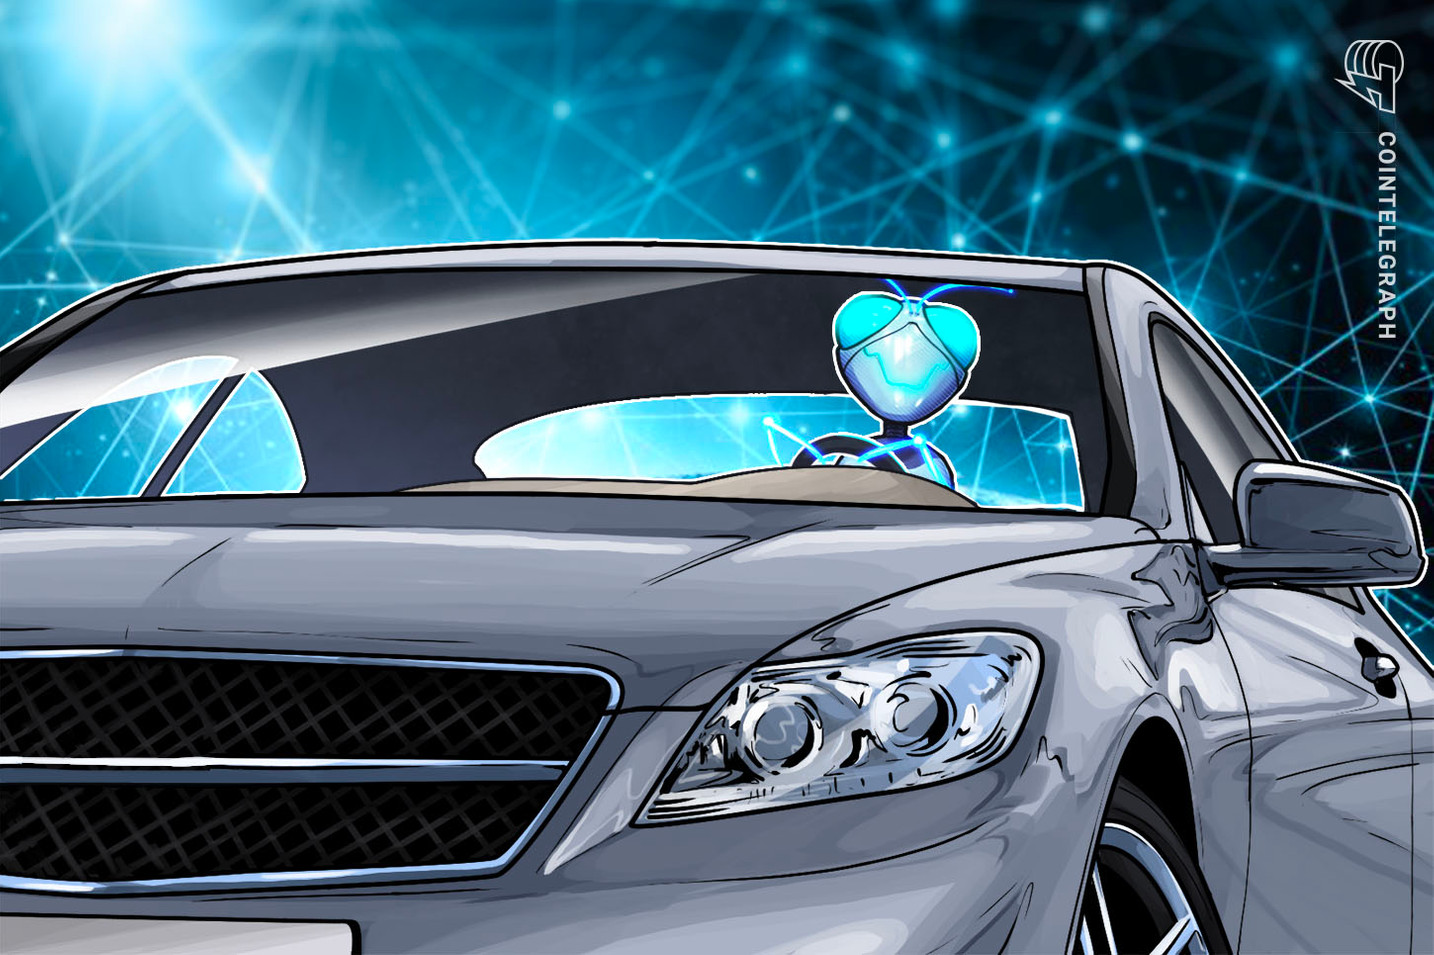 Siemens Considers Using Blockchain Tech for Carsharing